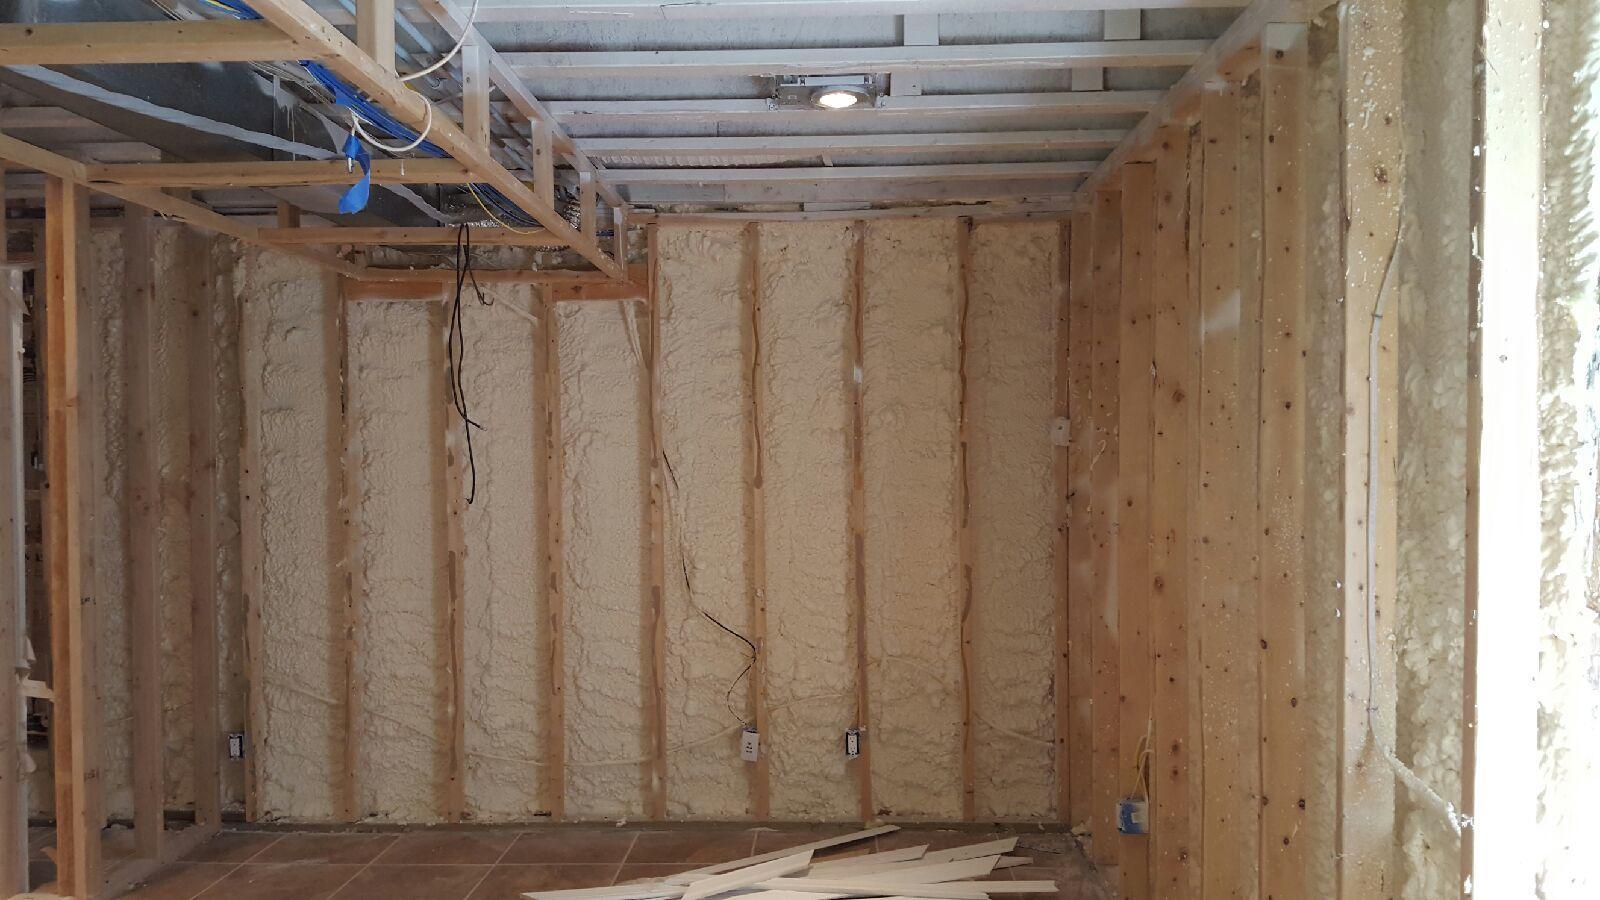 Basement humidity control- Vienna, VA - After Photo